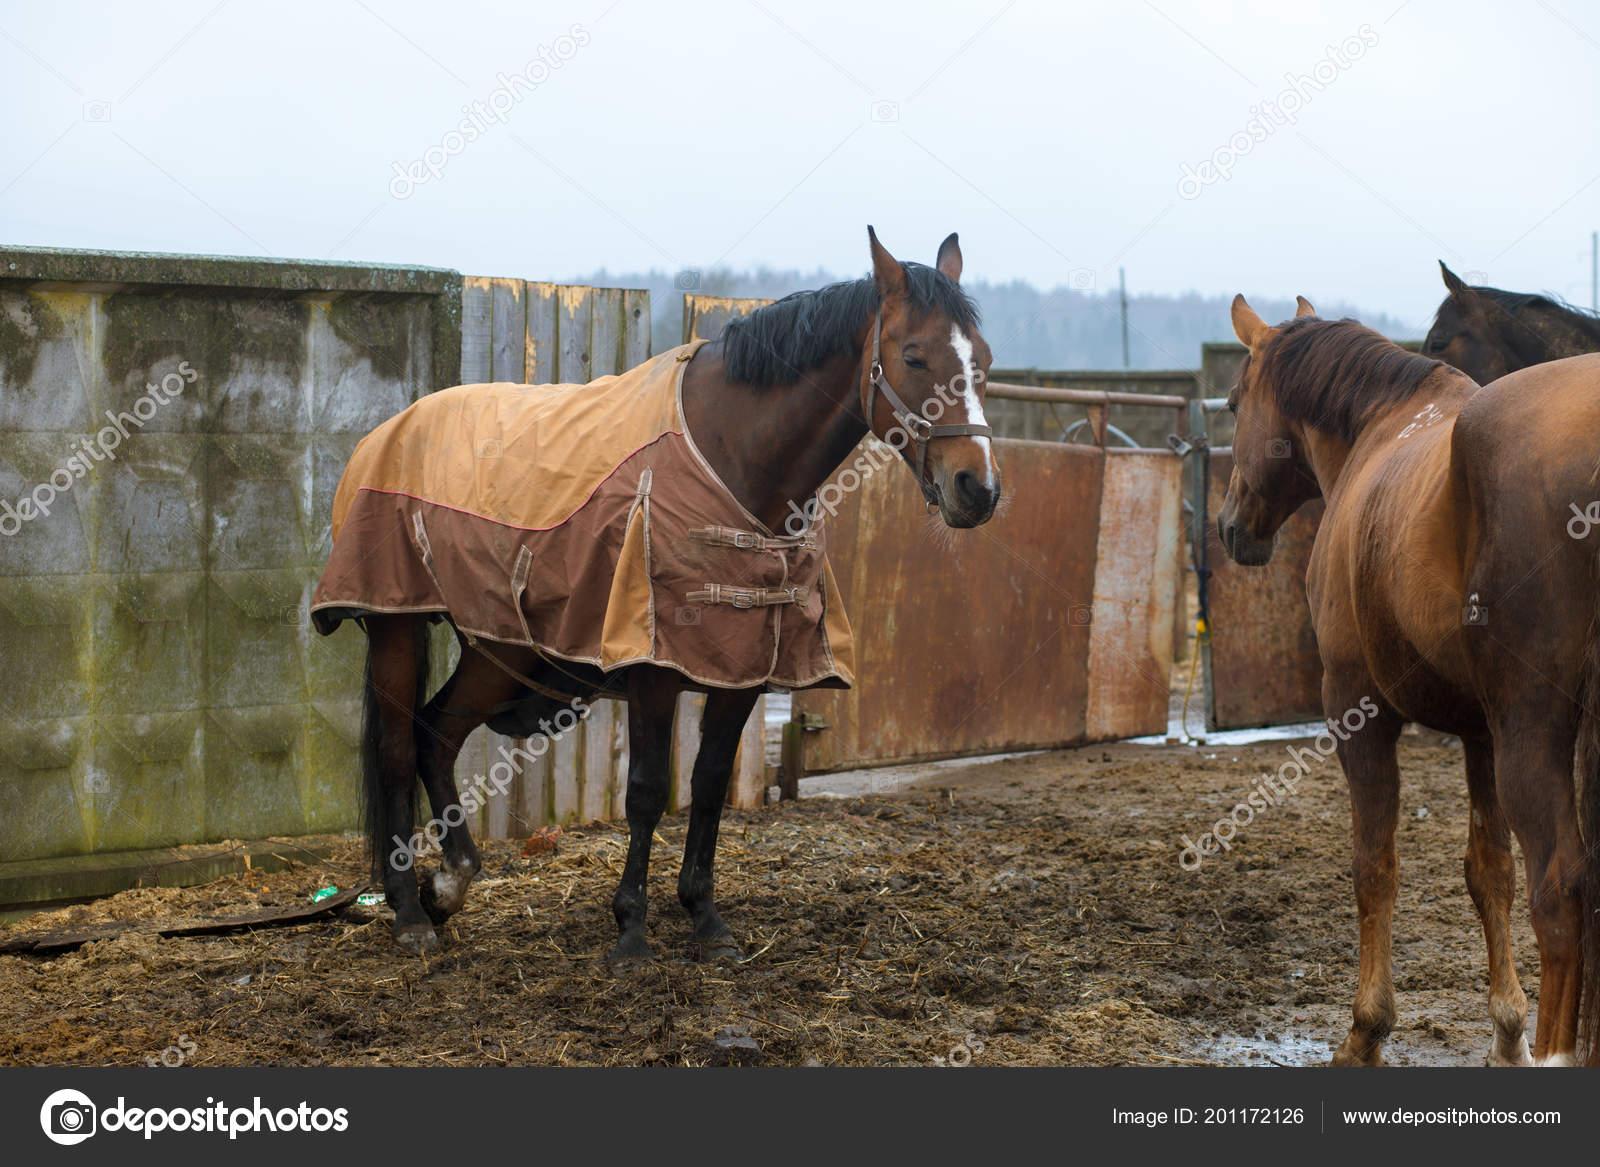 Beautiful Horses Animals Pasture Stables Horseback Riding Stock Photo C Vitizh 201172126